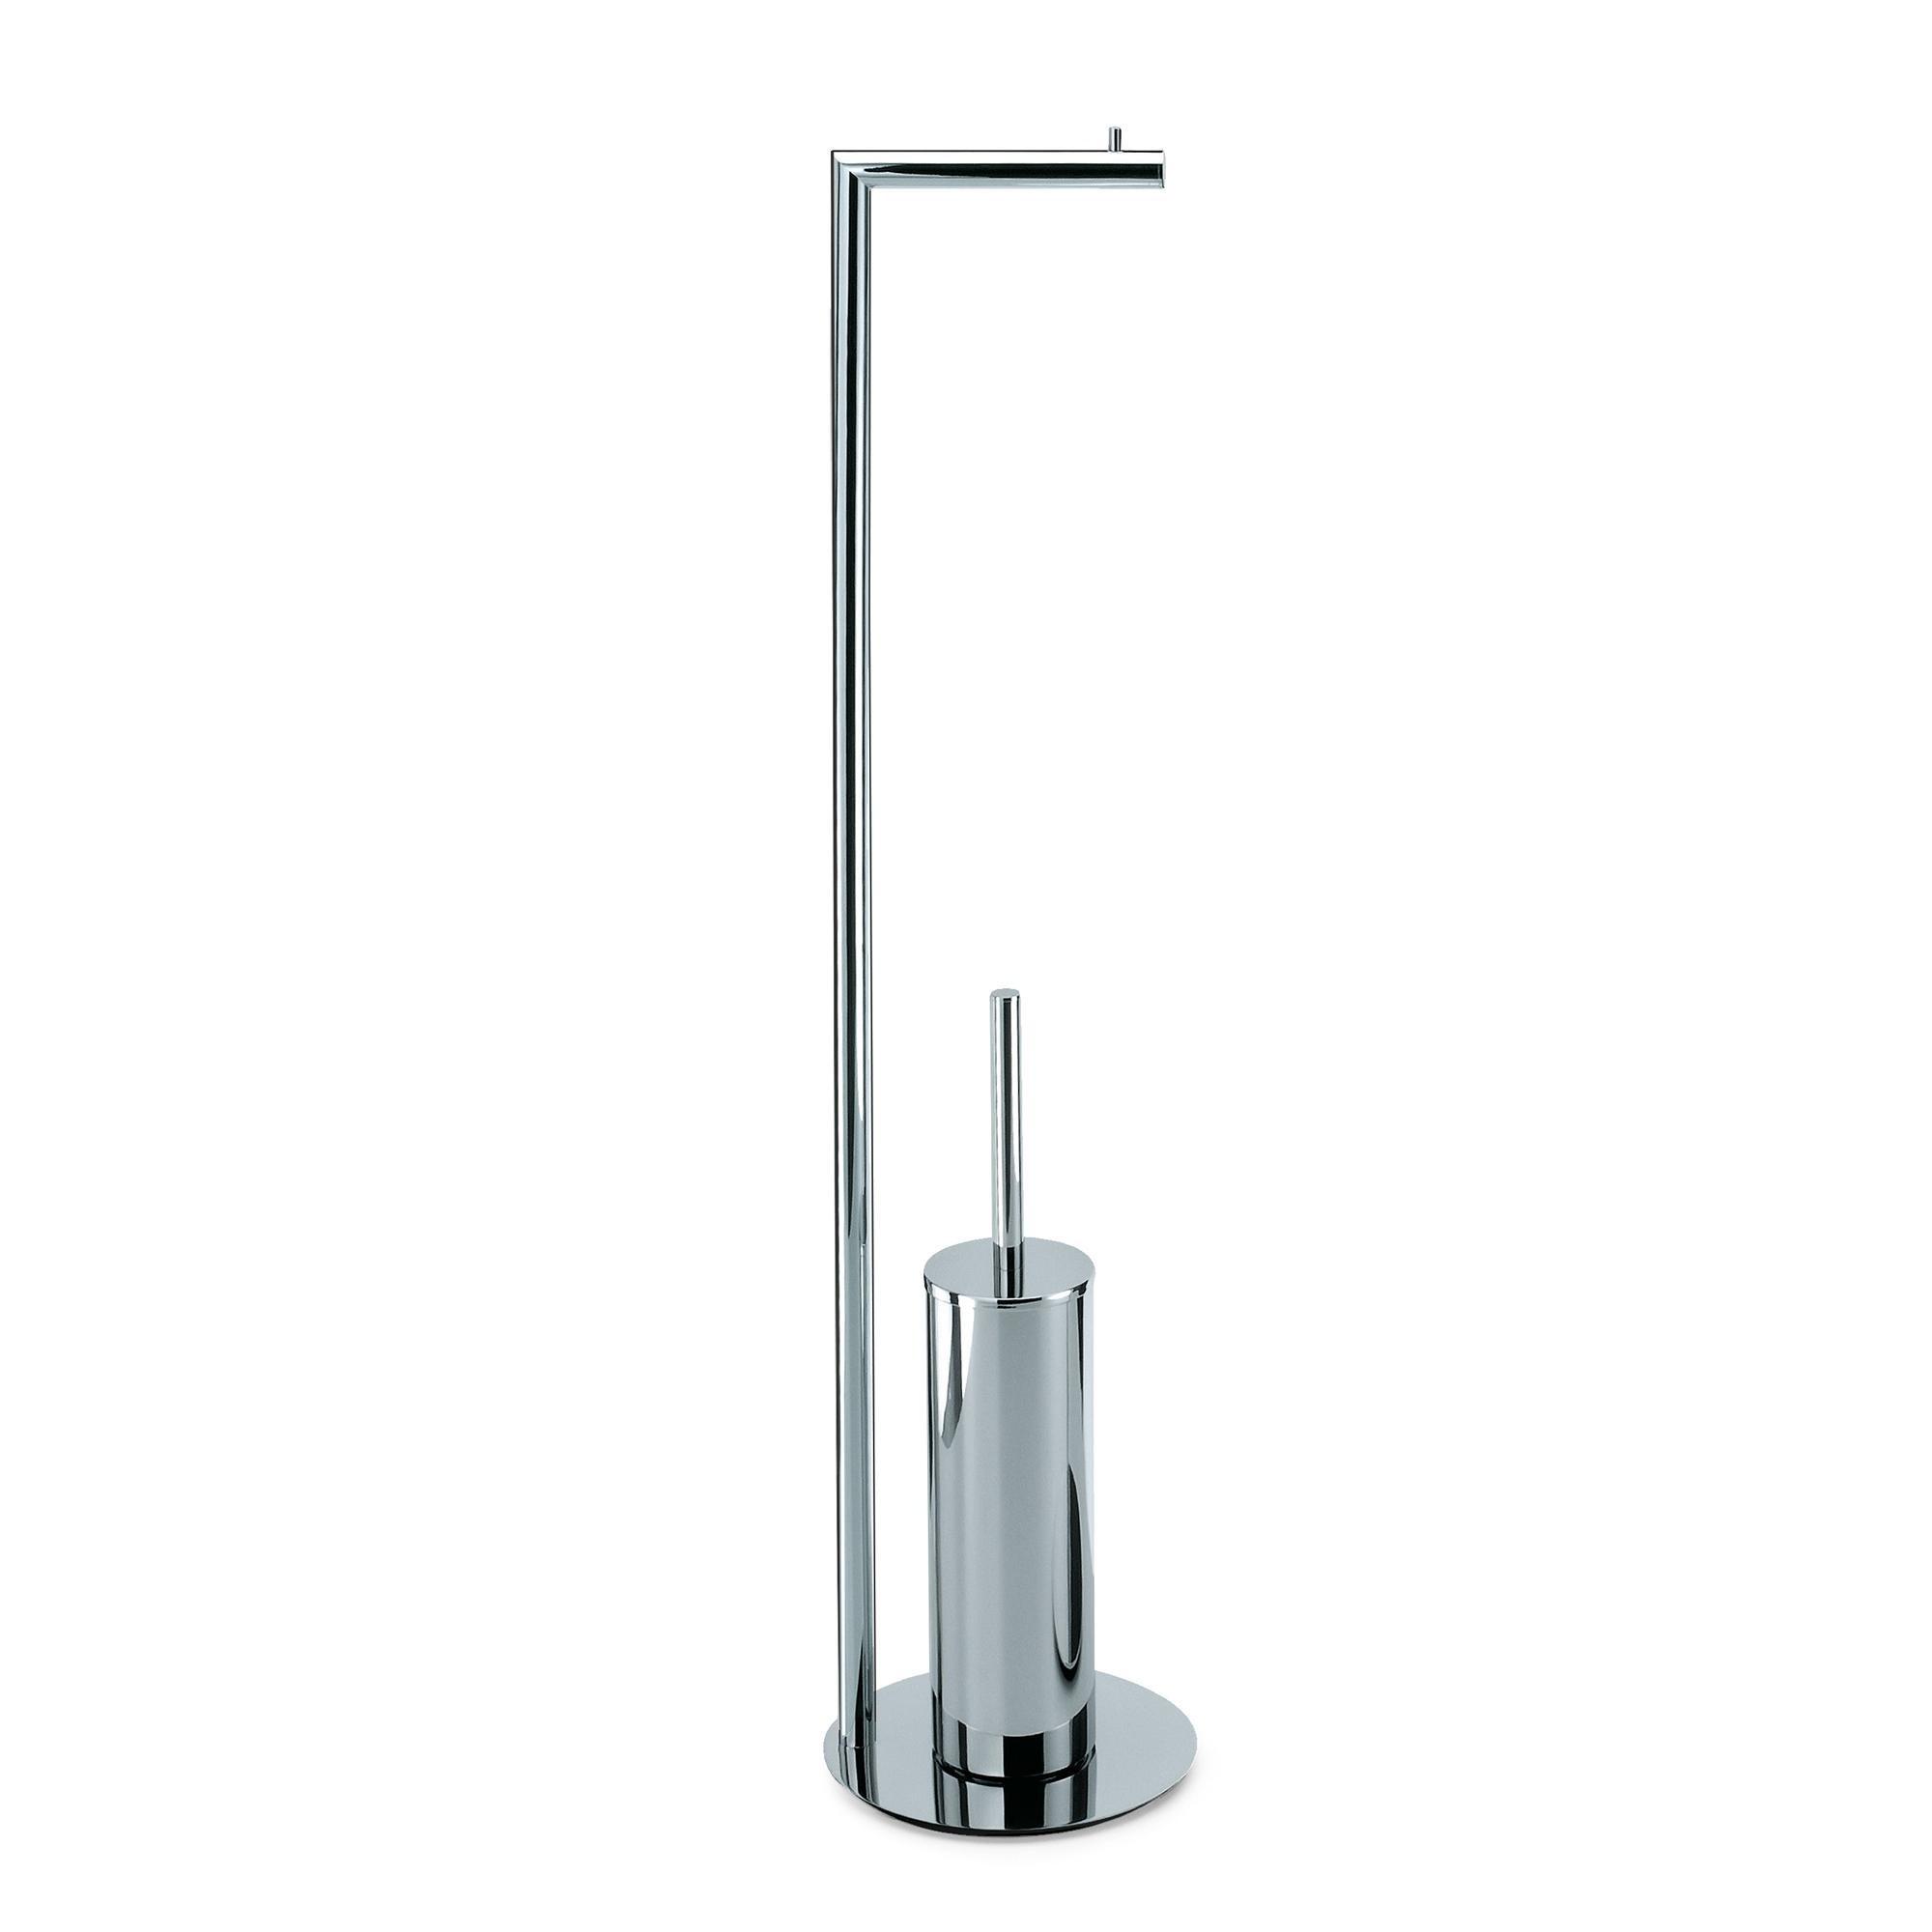 Decor Walther Bathroom Accessories.Straight 7 Toilet Brush Set